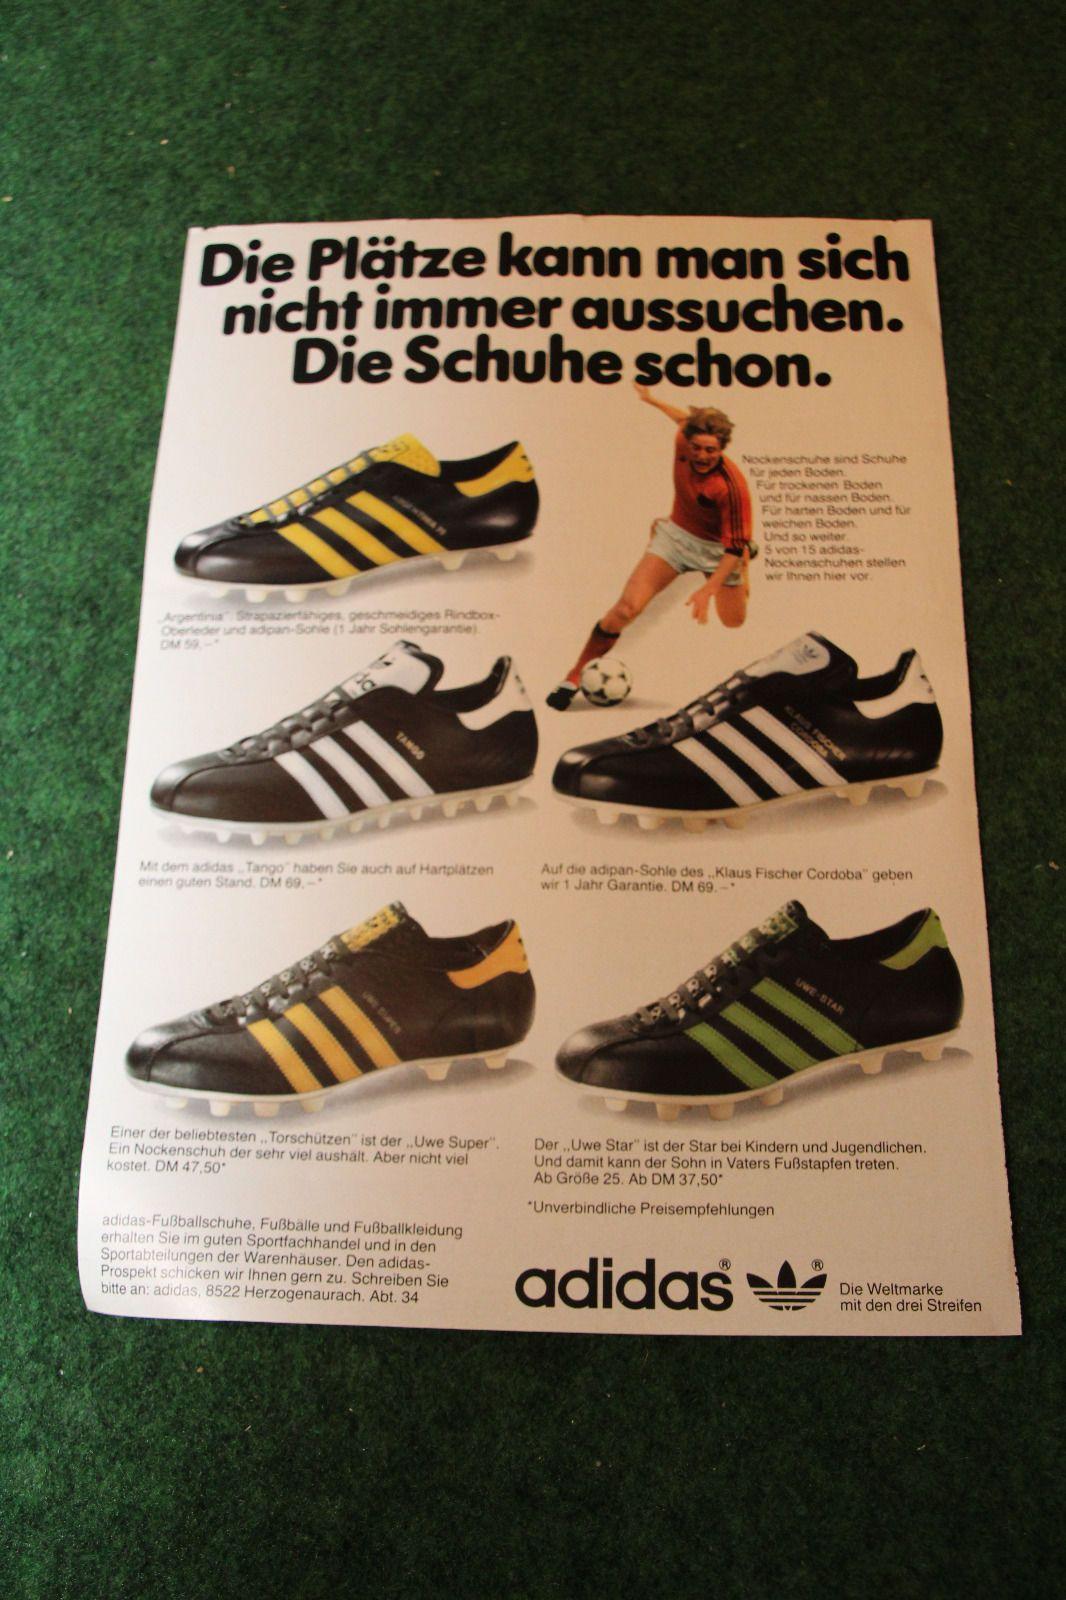 Sleep Schuh Play Alte Fussball WerbungEbay Eat Adidas 8OkN0nwPX